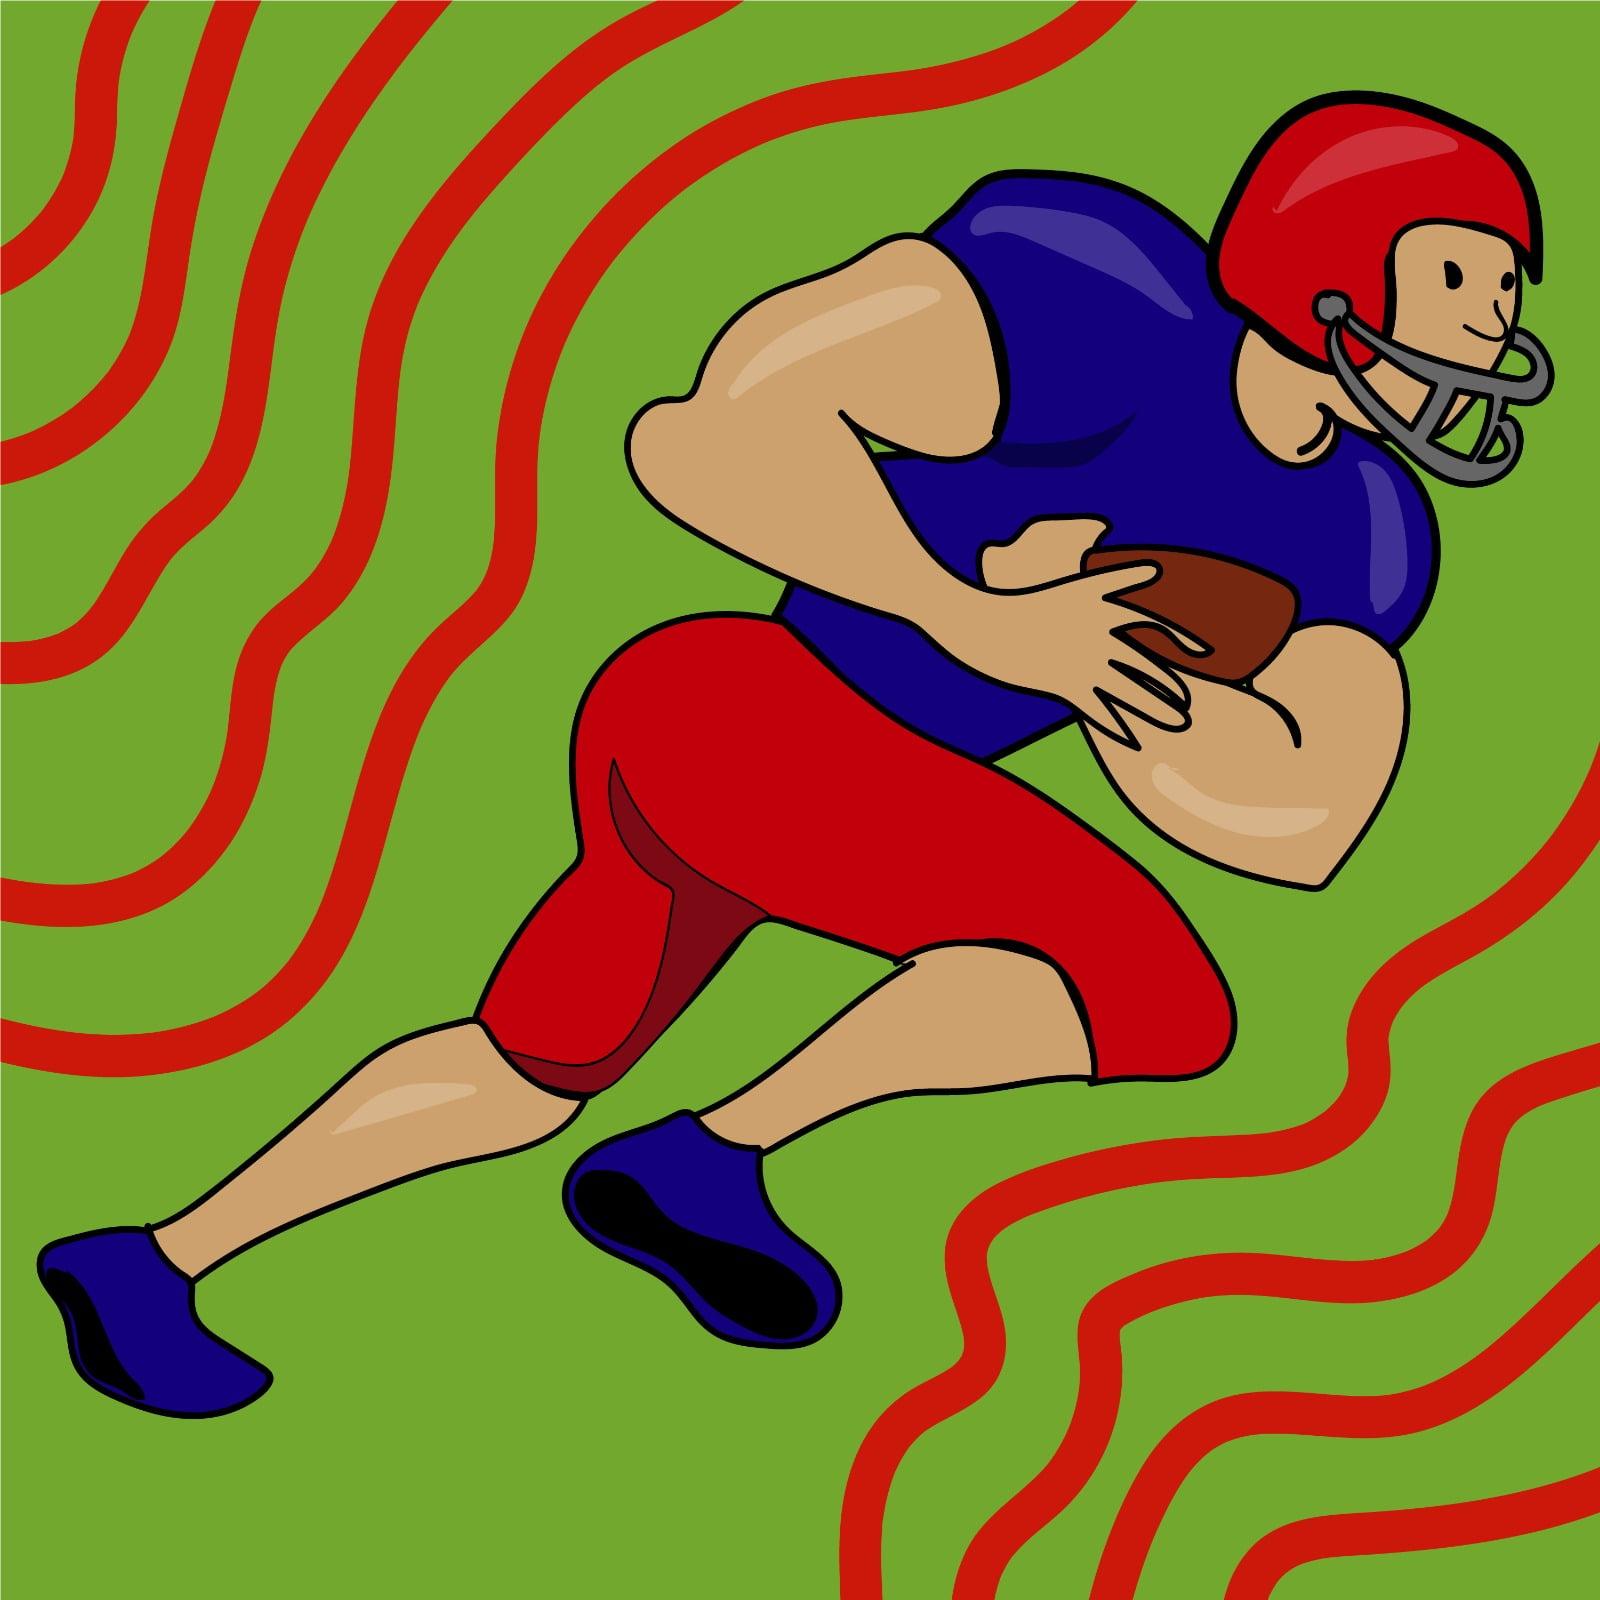 Rita Azar illustrates football player for 360 MAGAZINE